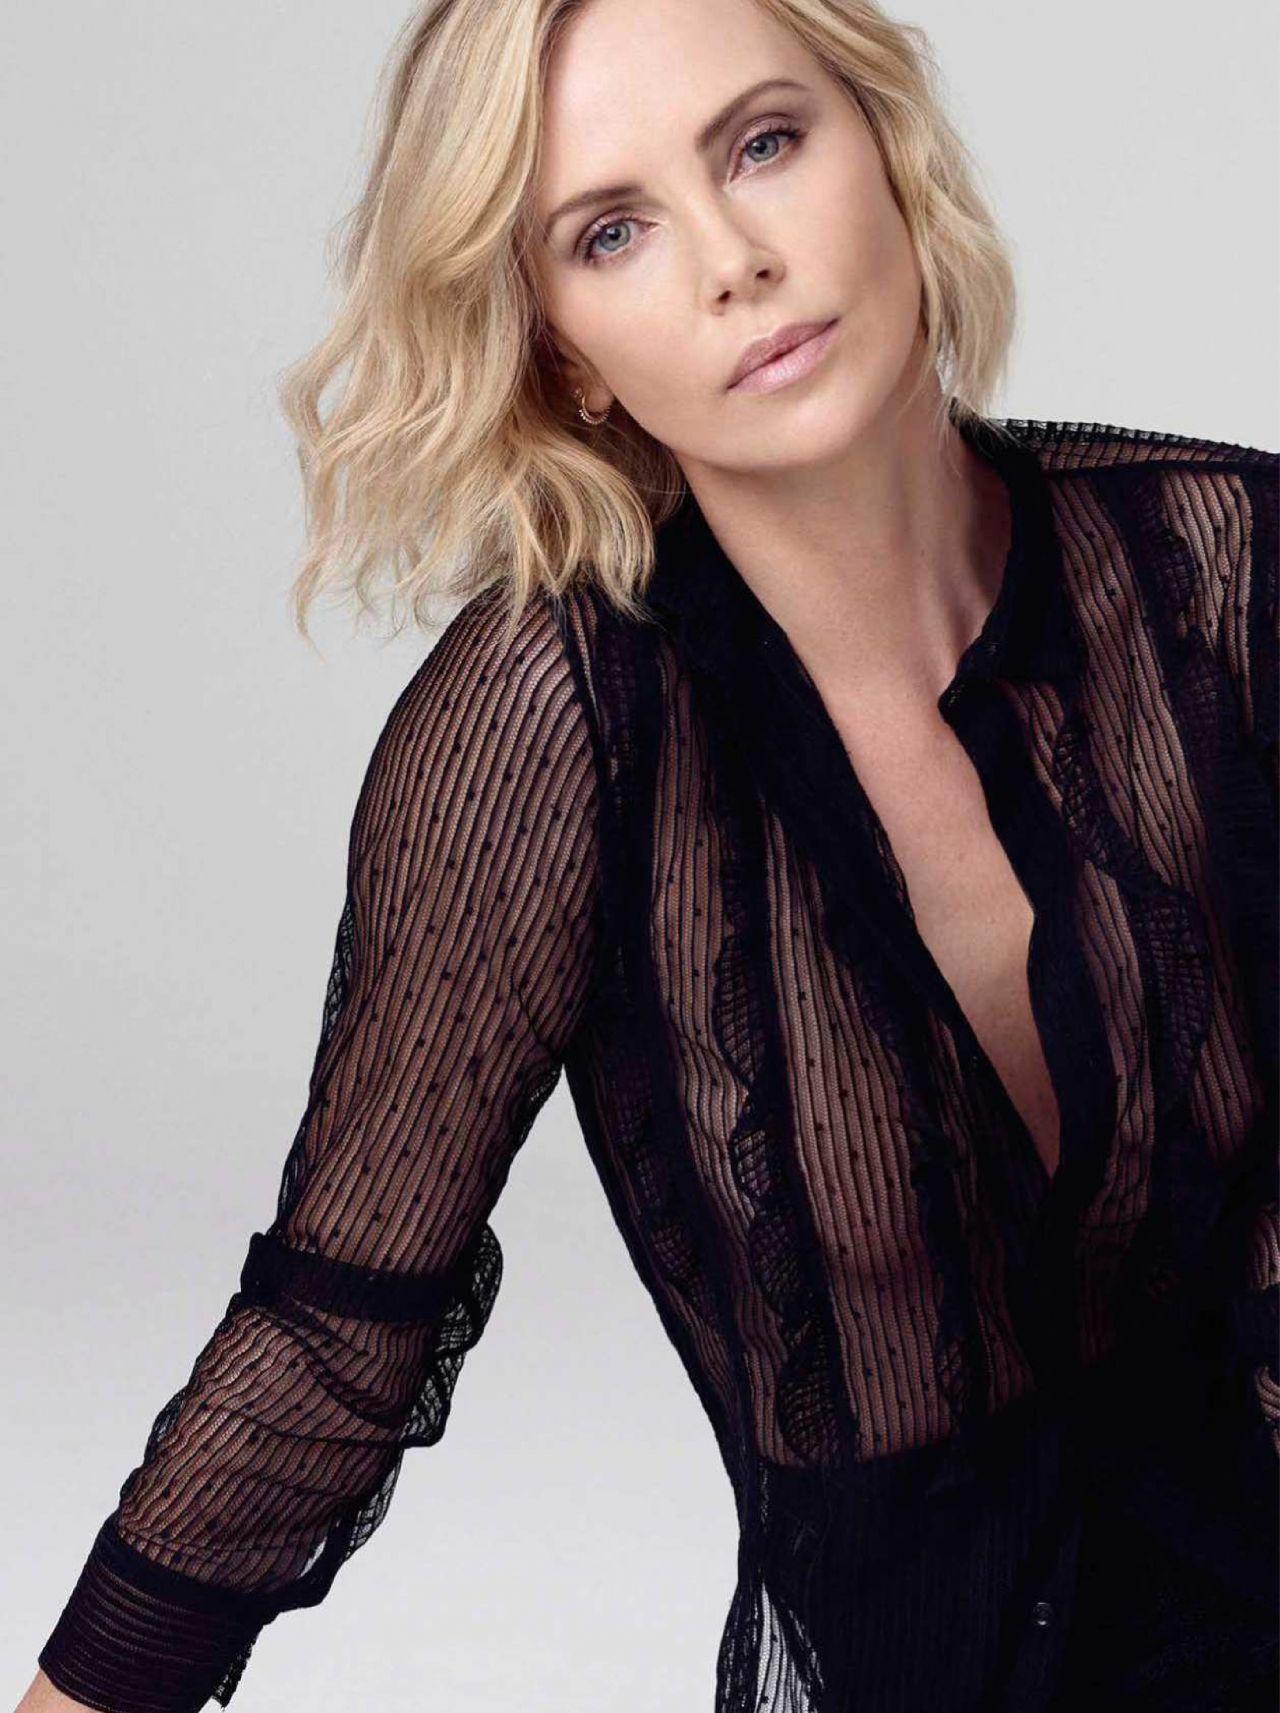 Angelina jolie michelle williams sarah silverman nude hd - 3 part 9